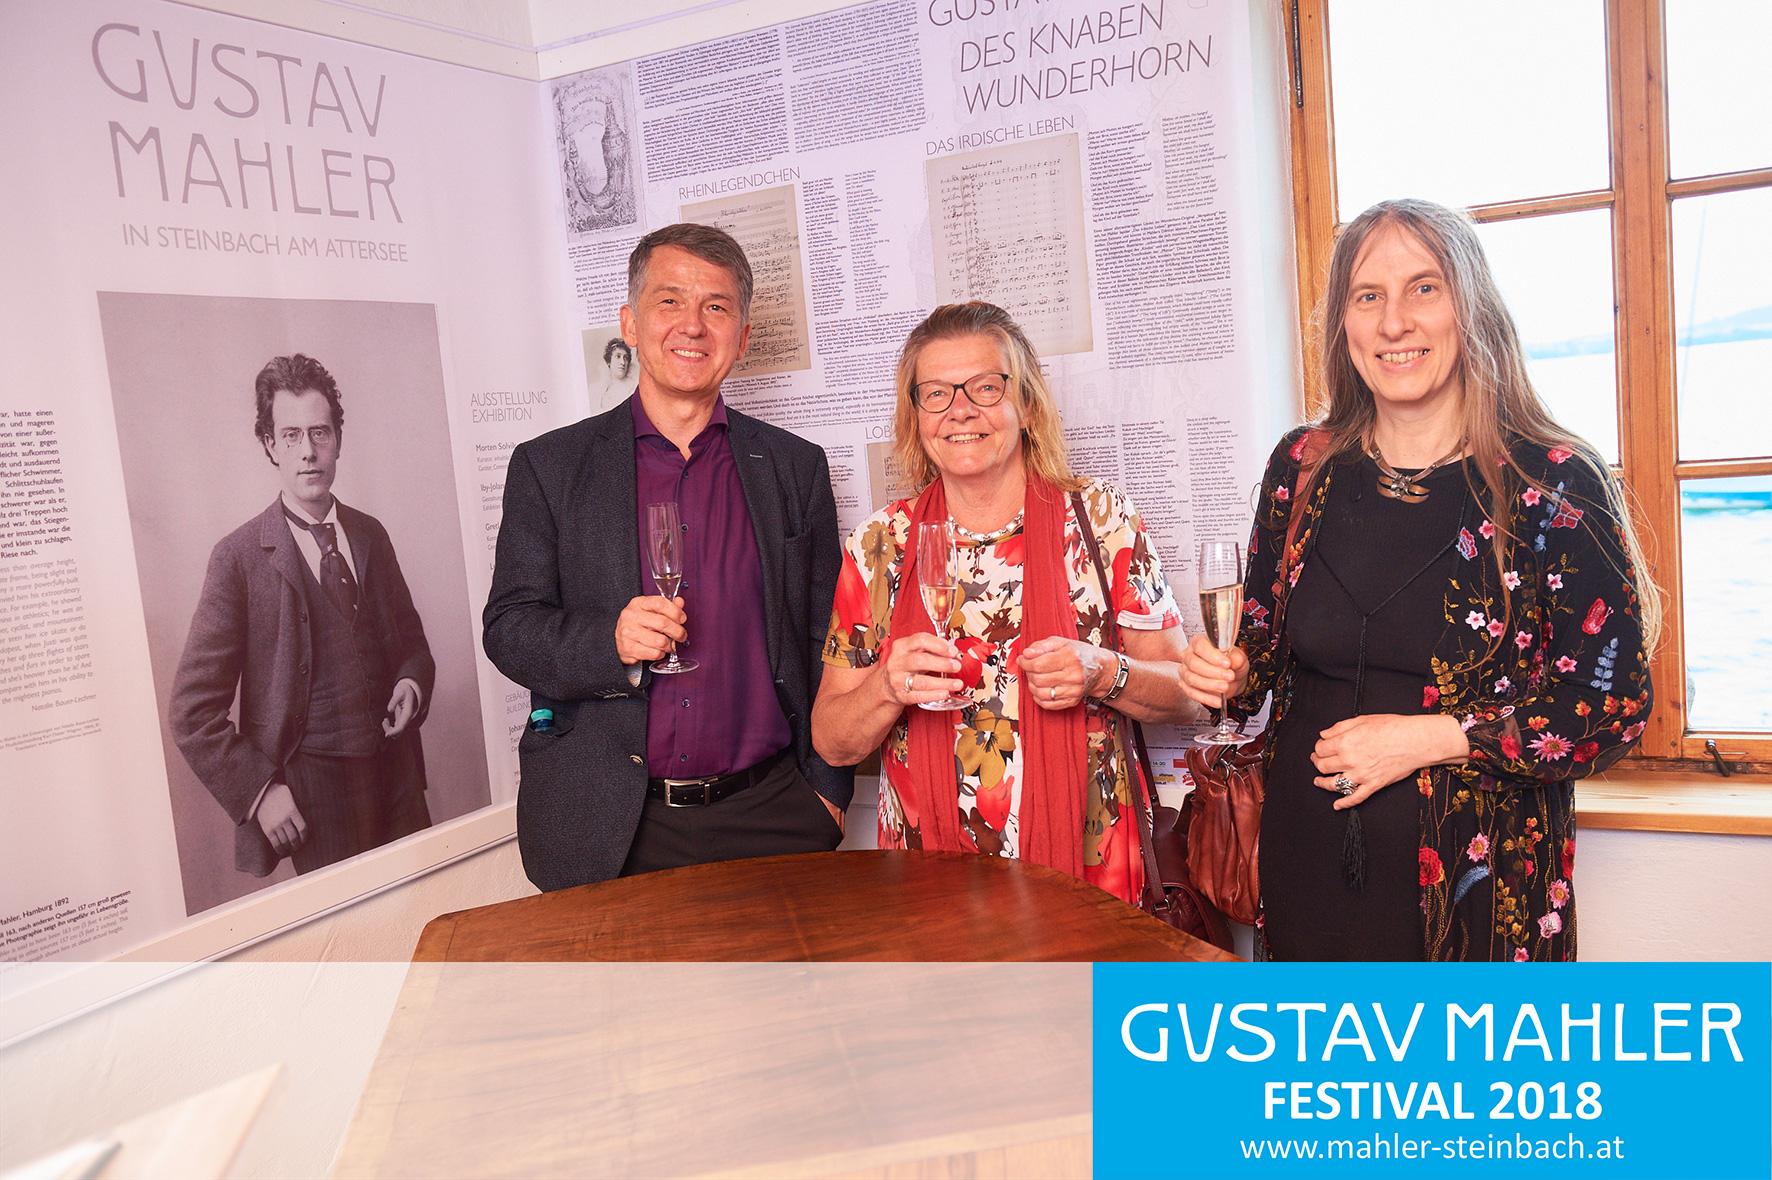 Team Ausstellung: v.l. Dr. Morten Solvik, Dr. Renate Stark-Voit, Iby Jolande Varga